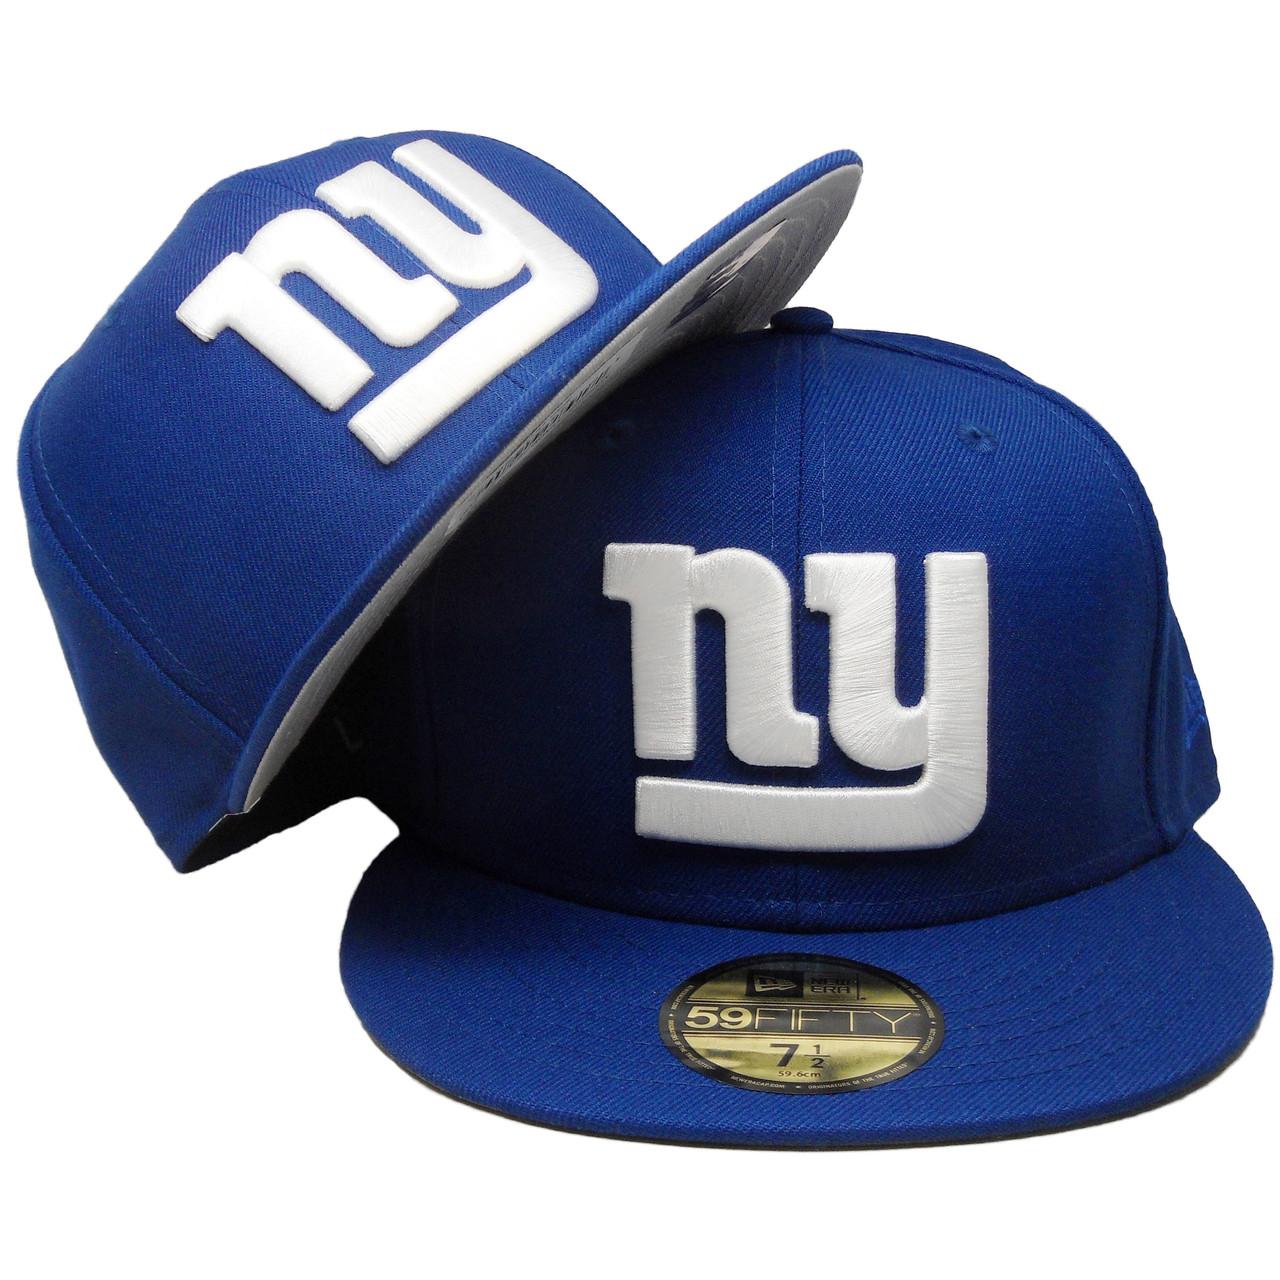 super popular 0c0ed f7e72 New York Giants New Era Custom New Era 59Fifty Fitted Hat - Royal, White -  ECapsUnlimited.com